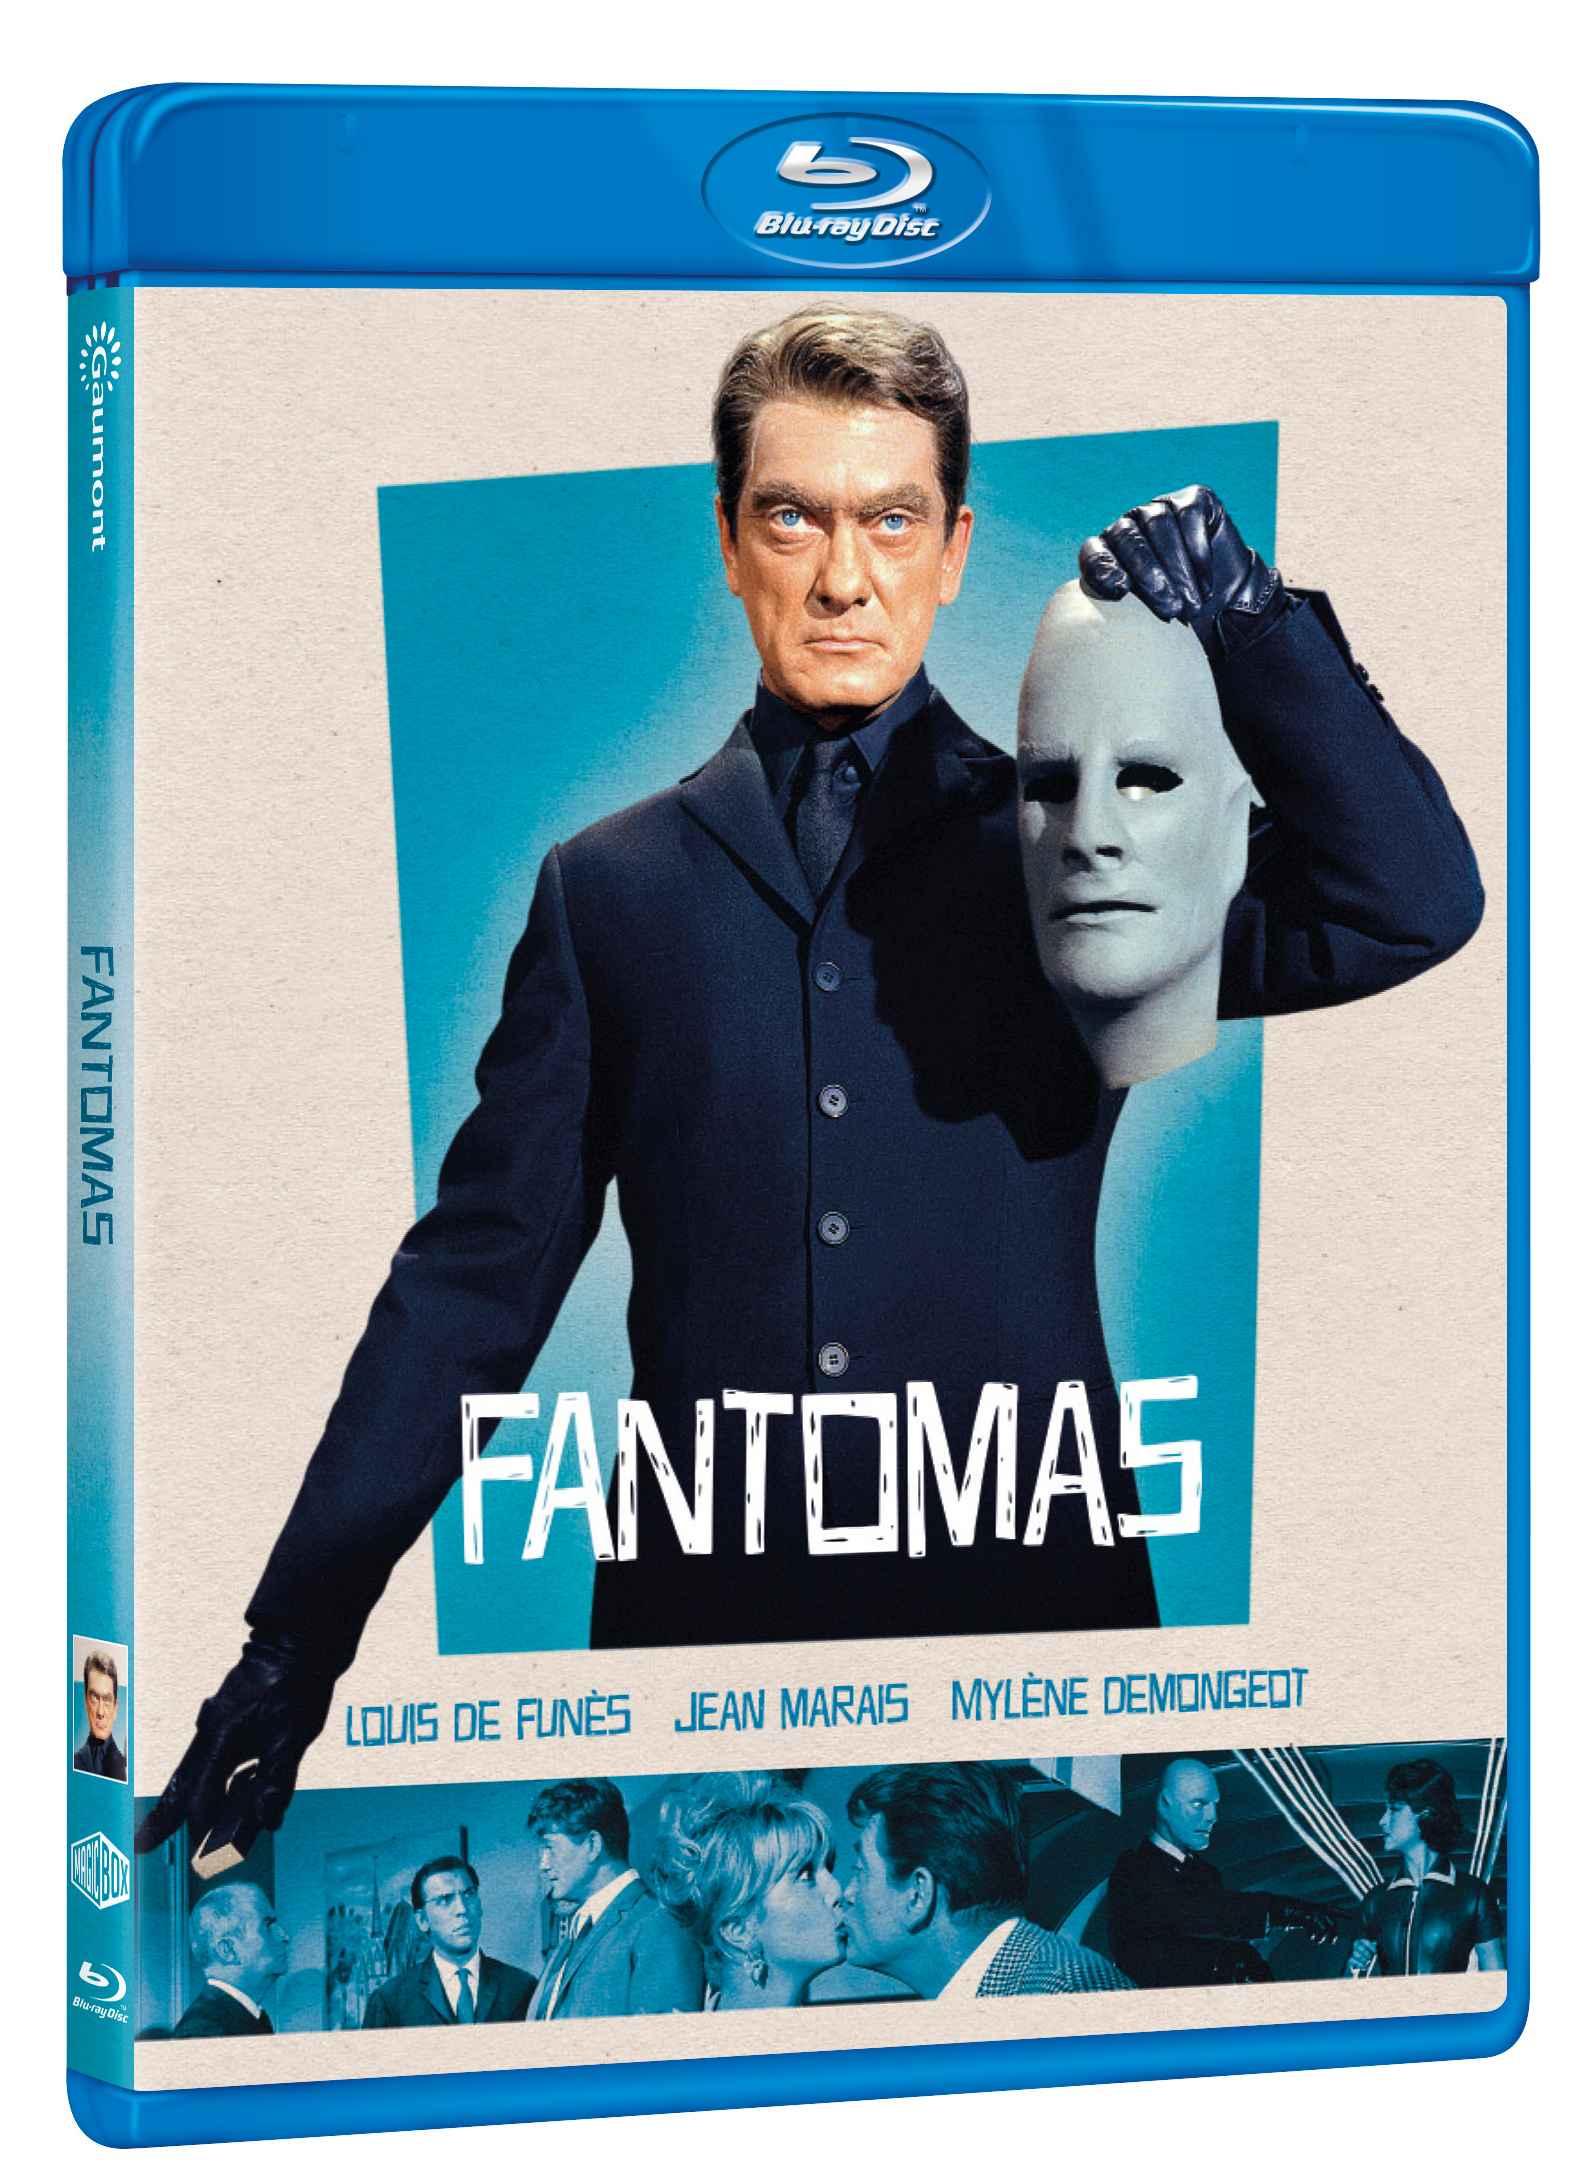 Fantomas - Blu-ray